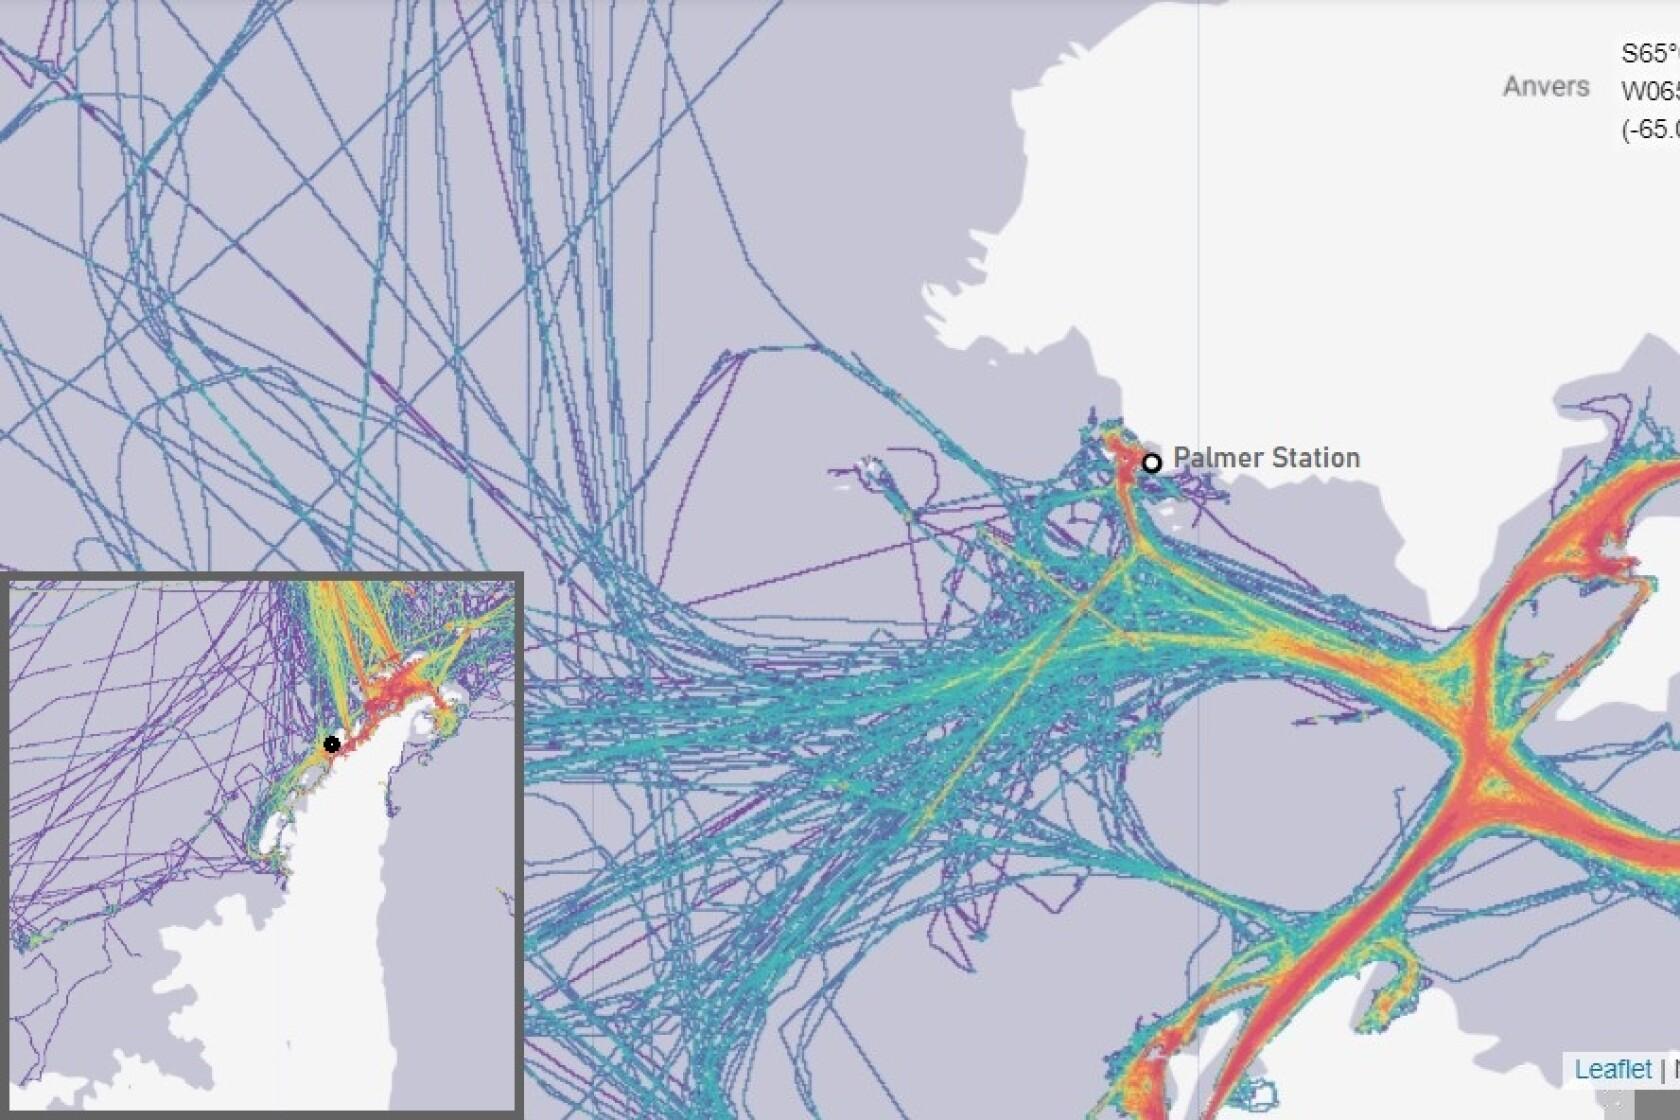 Boat traffic heat map for 2019 at Palmer Station, Antarctica; Monterey Bay, California; and Stellwagen Bank.